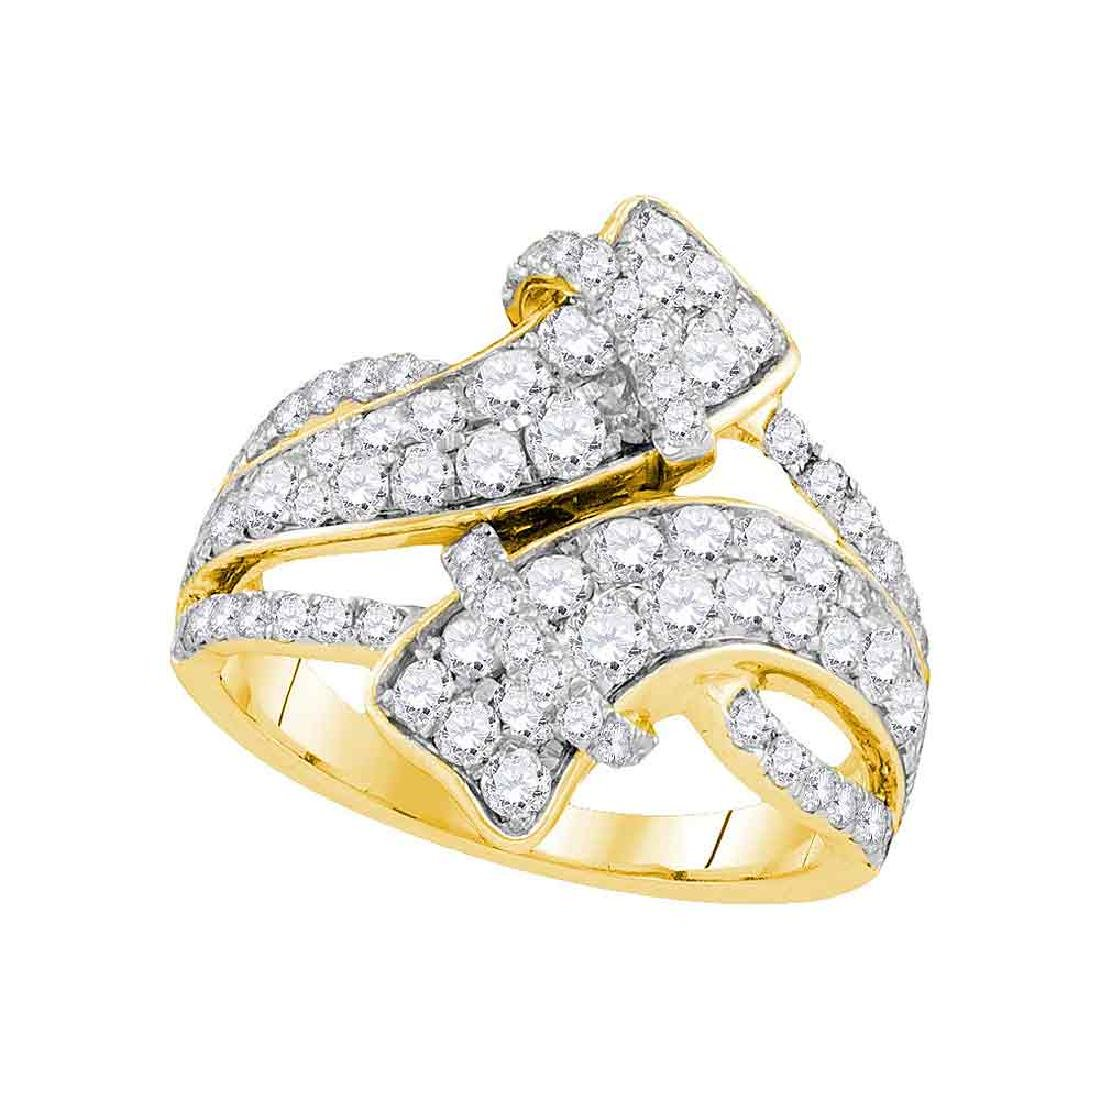 2 CTW Diamond Bypass Crossover Luxury Ring 14KT Yellow